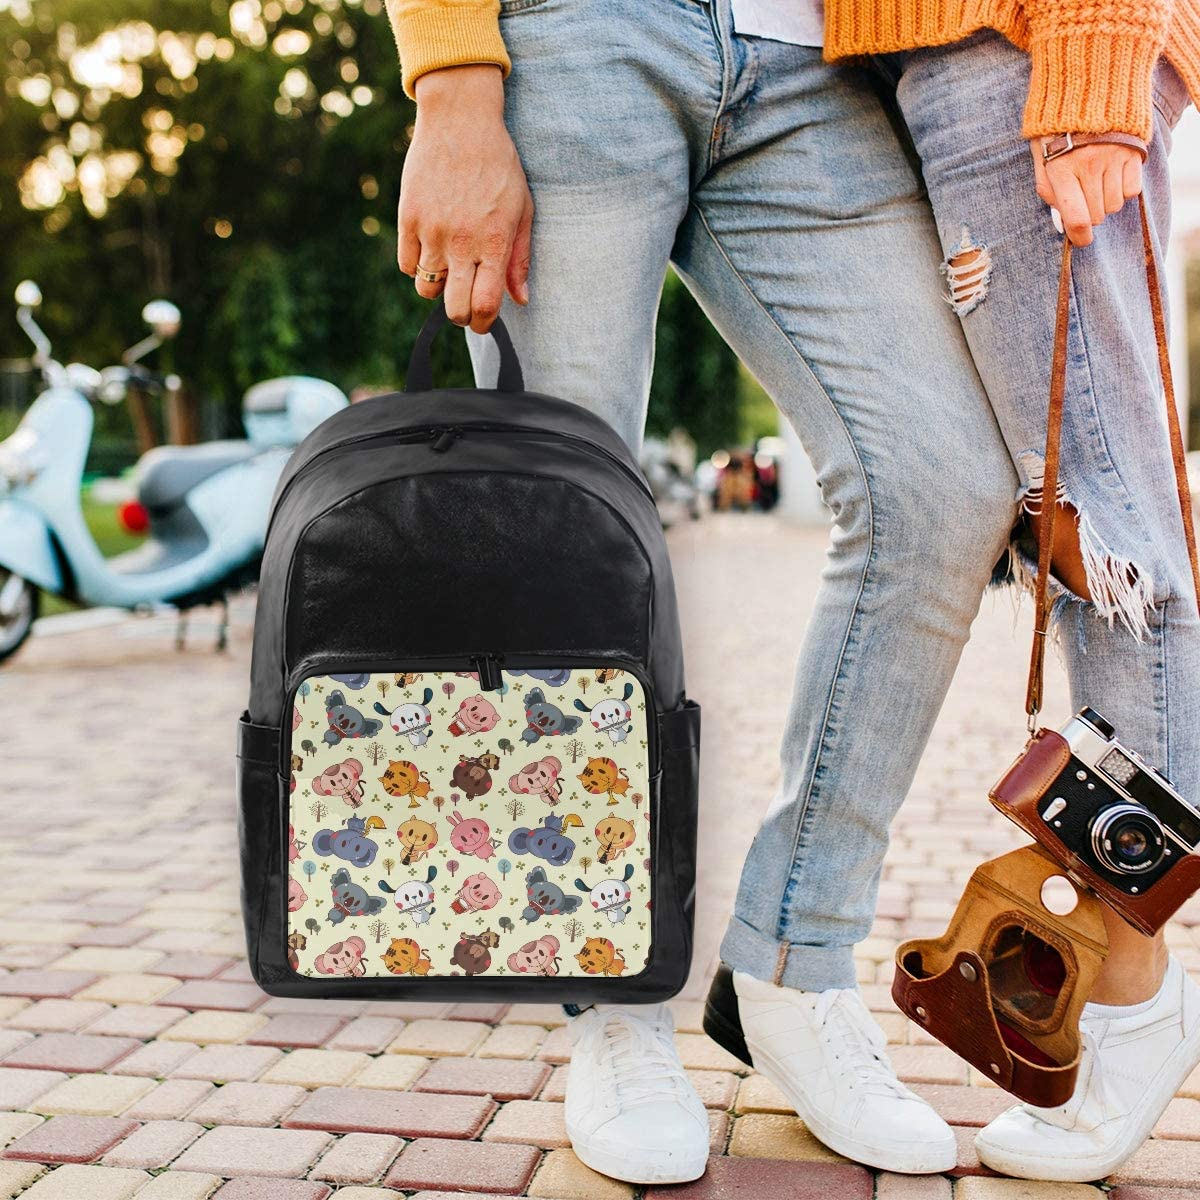 FANTAZIO Backpacks Cartoon Animals Tiger Elephant and Dog School Bag Canvas Daypack with Zipper